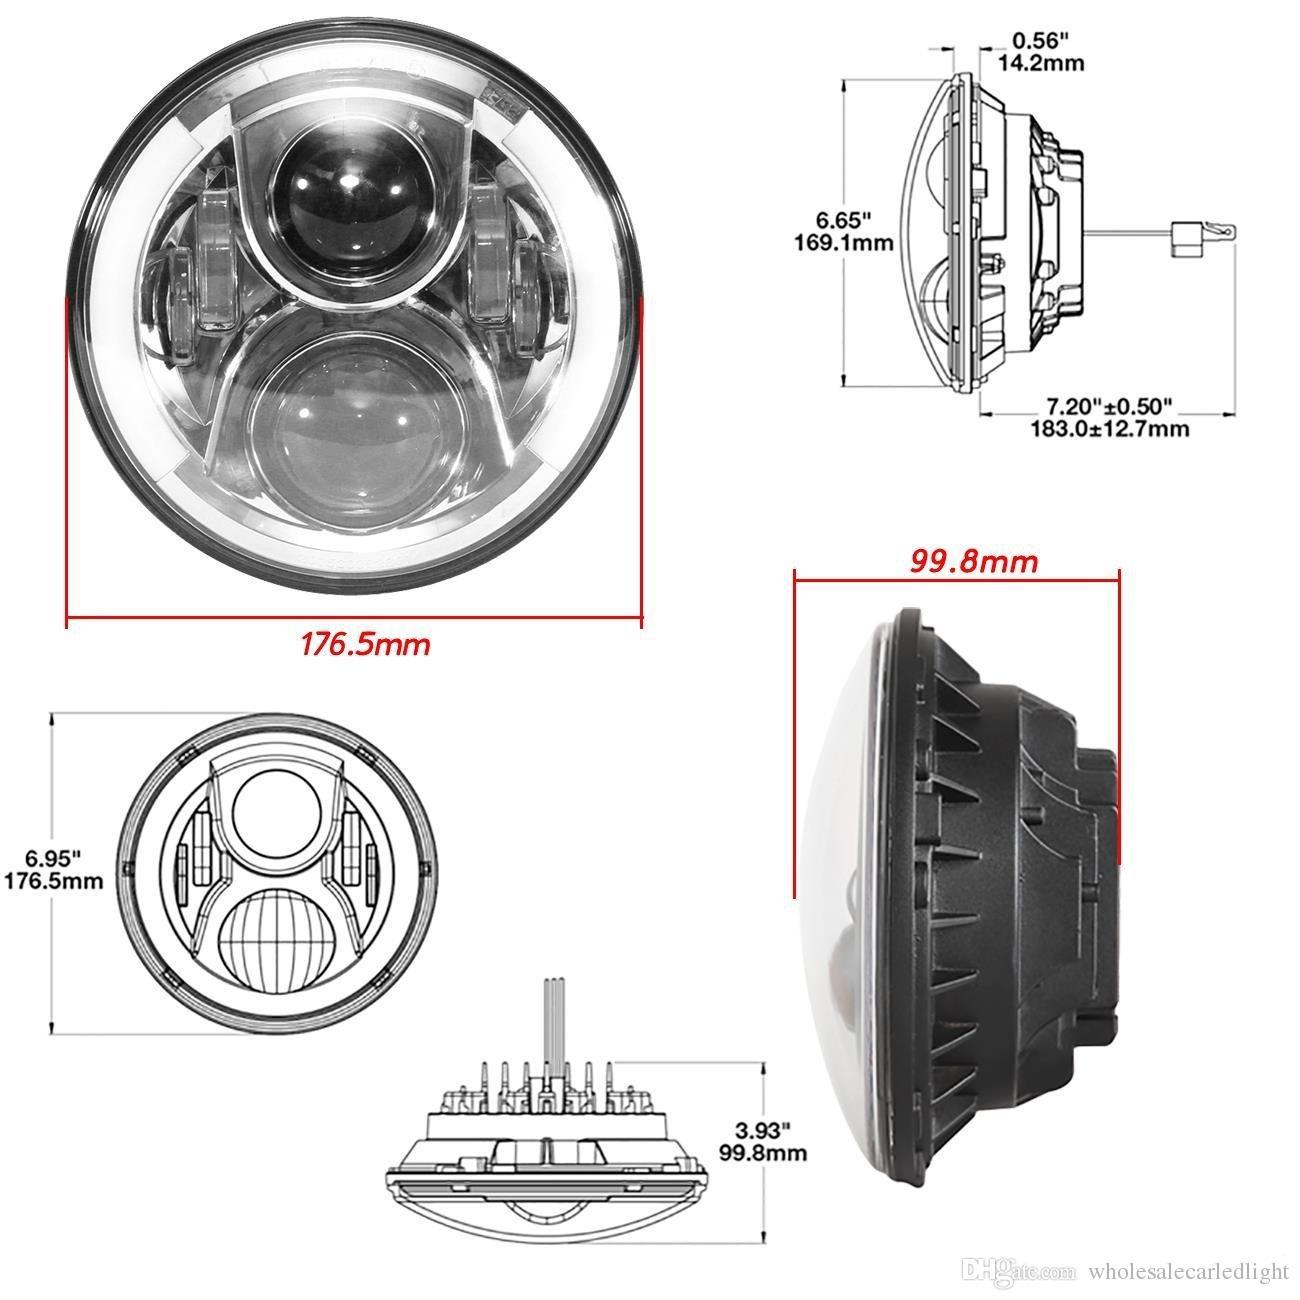 "7"" Inch Round LED Halo Headlights Bulb Lamp For Jeep Wrangler JK TJ LJ Hummer H1 H2 LED Headlamp Projector DRL Harley"